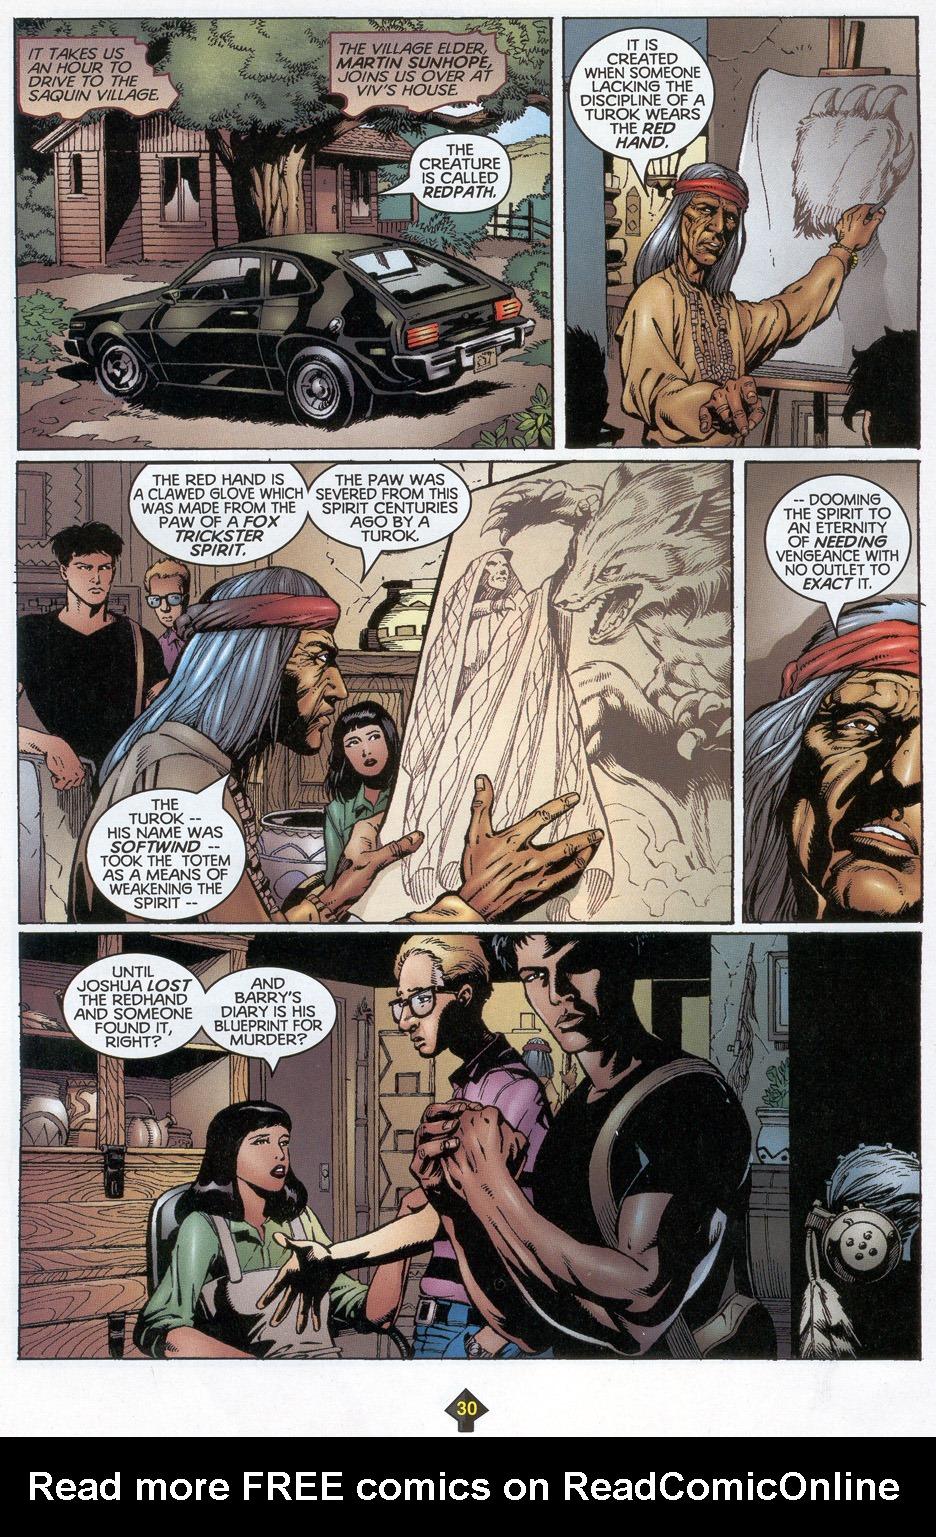 Read online Turok: Redpath comic -  Issue # Full - 29